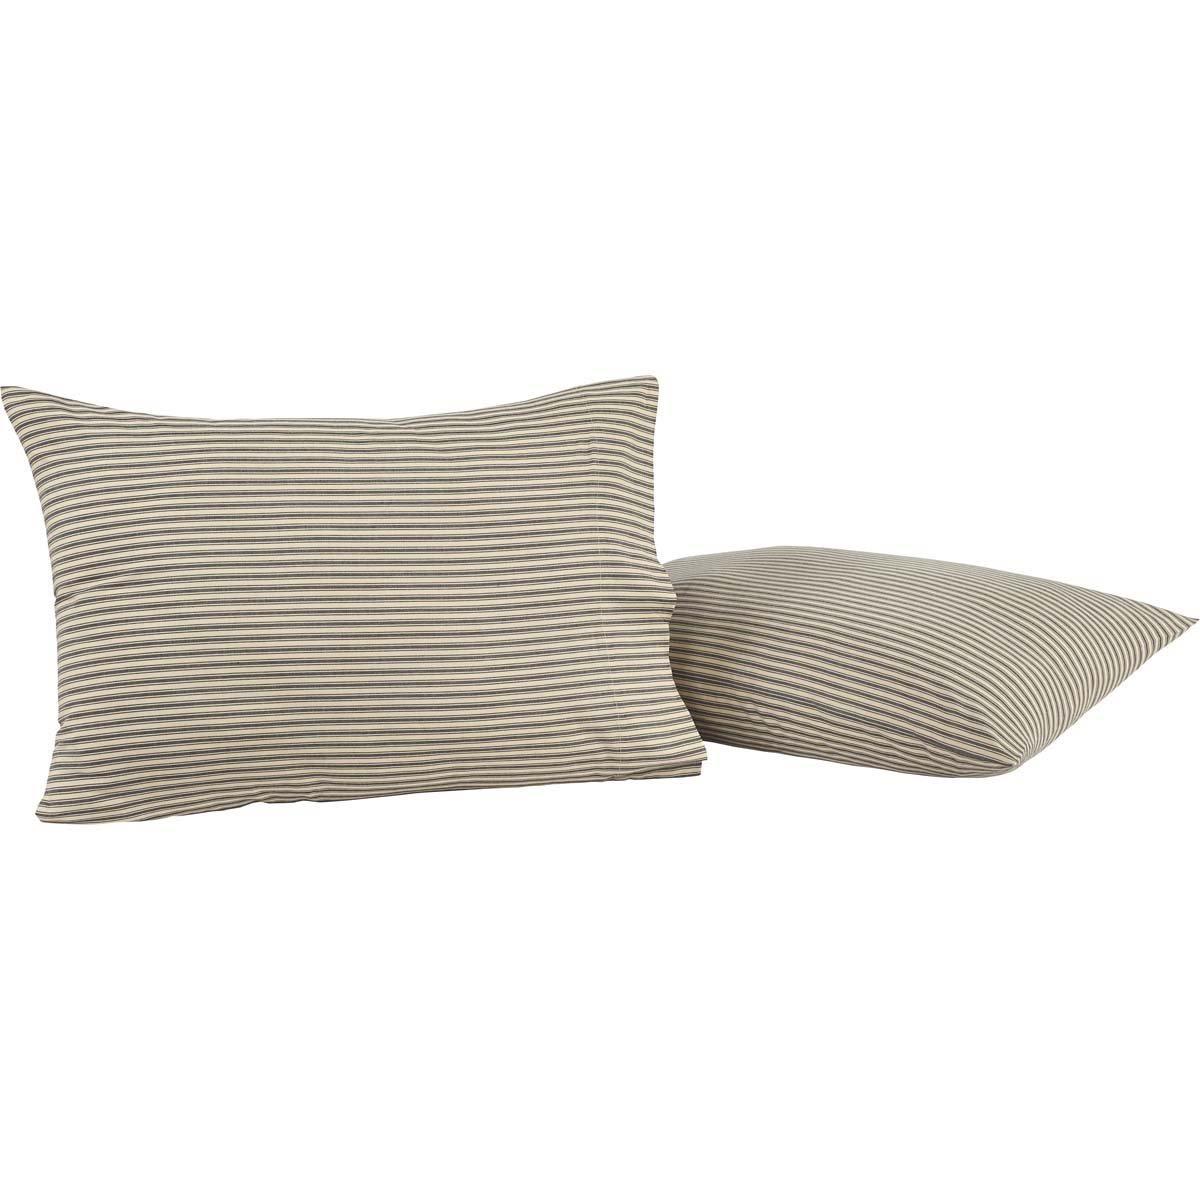 VHC Brands Farmhouse Bedding - Kendra Stripe White Pillow Case Set, Standard, Black